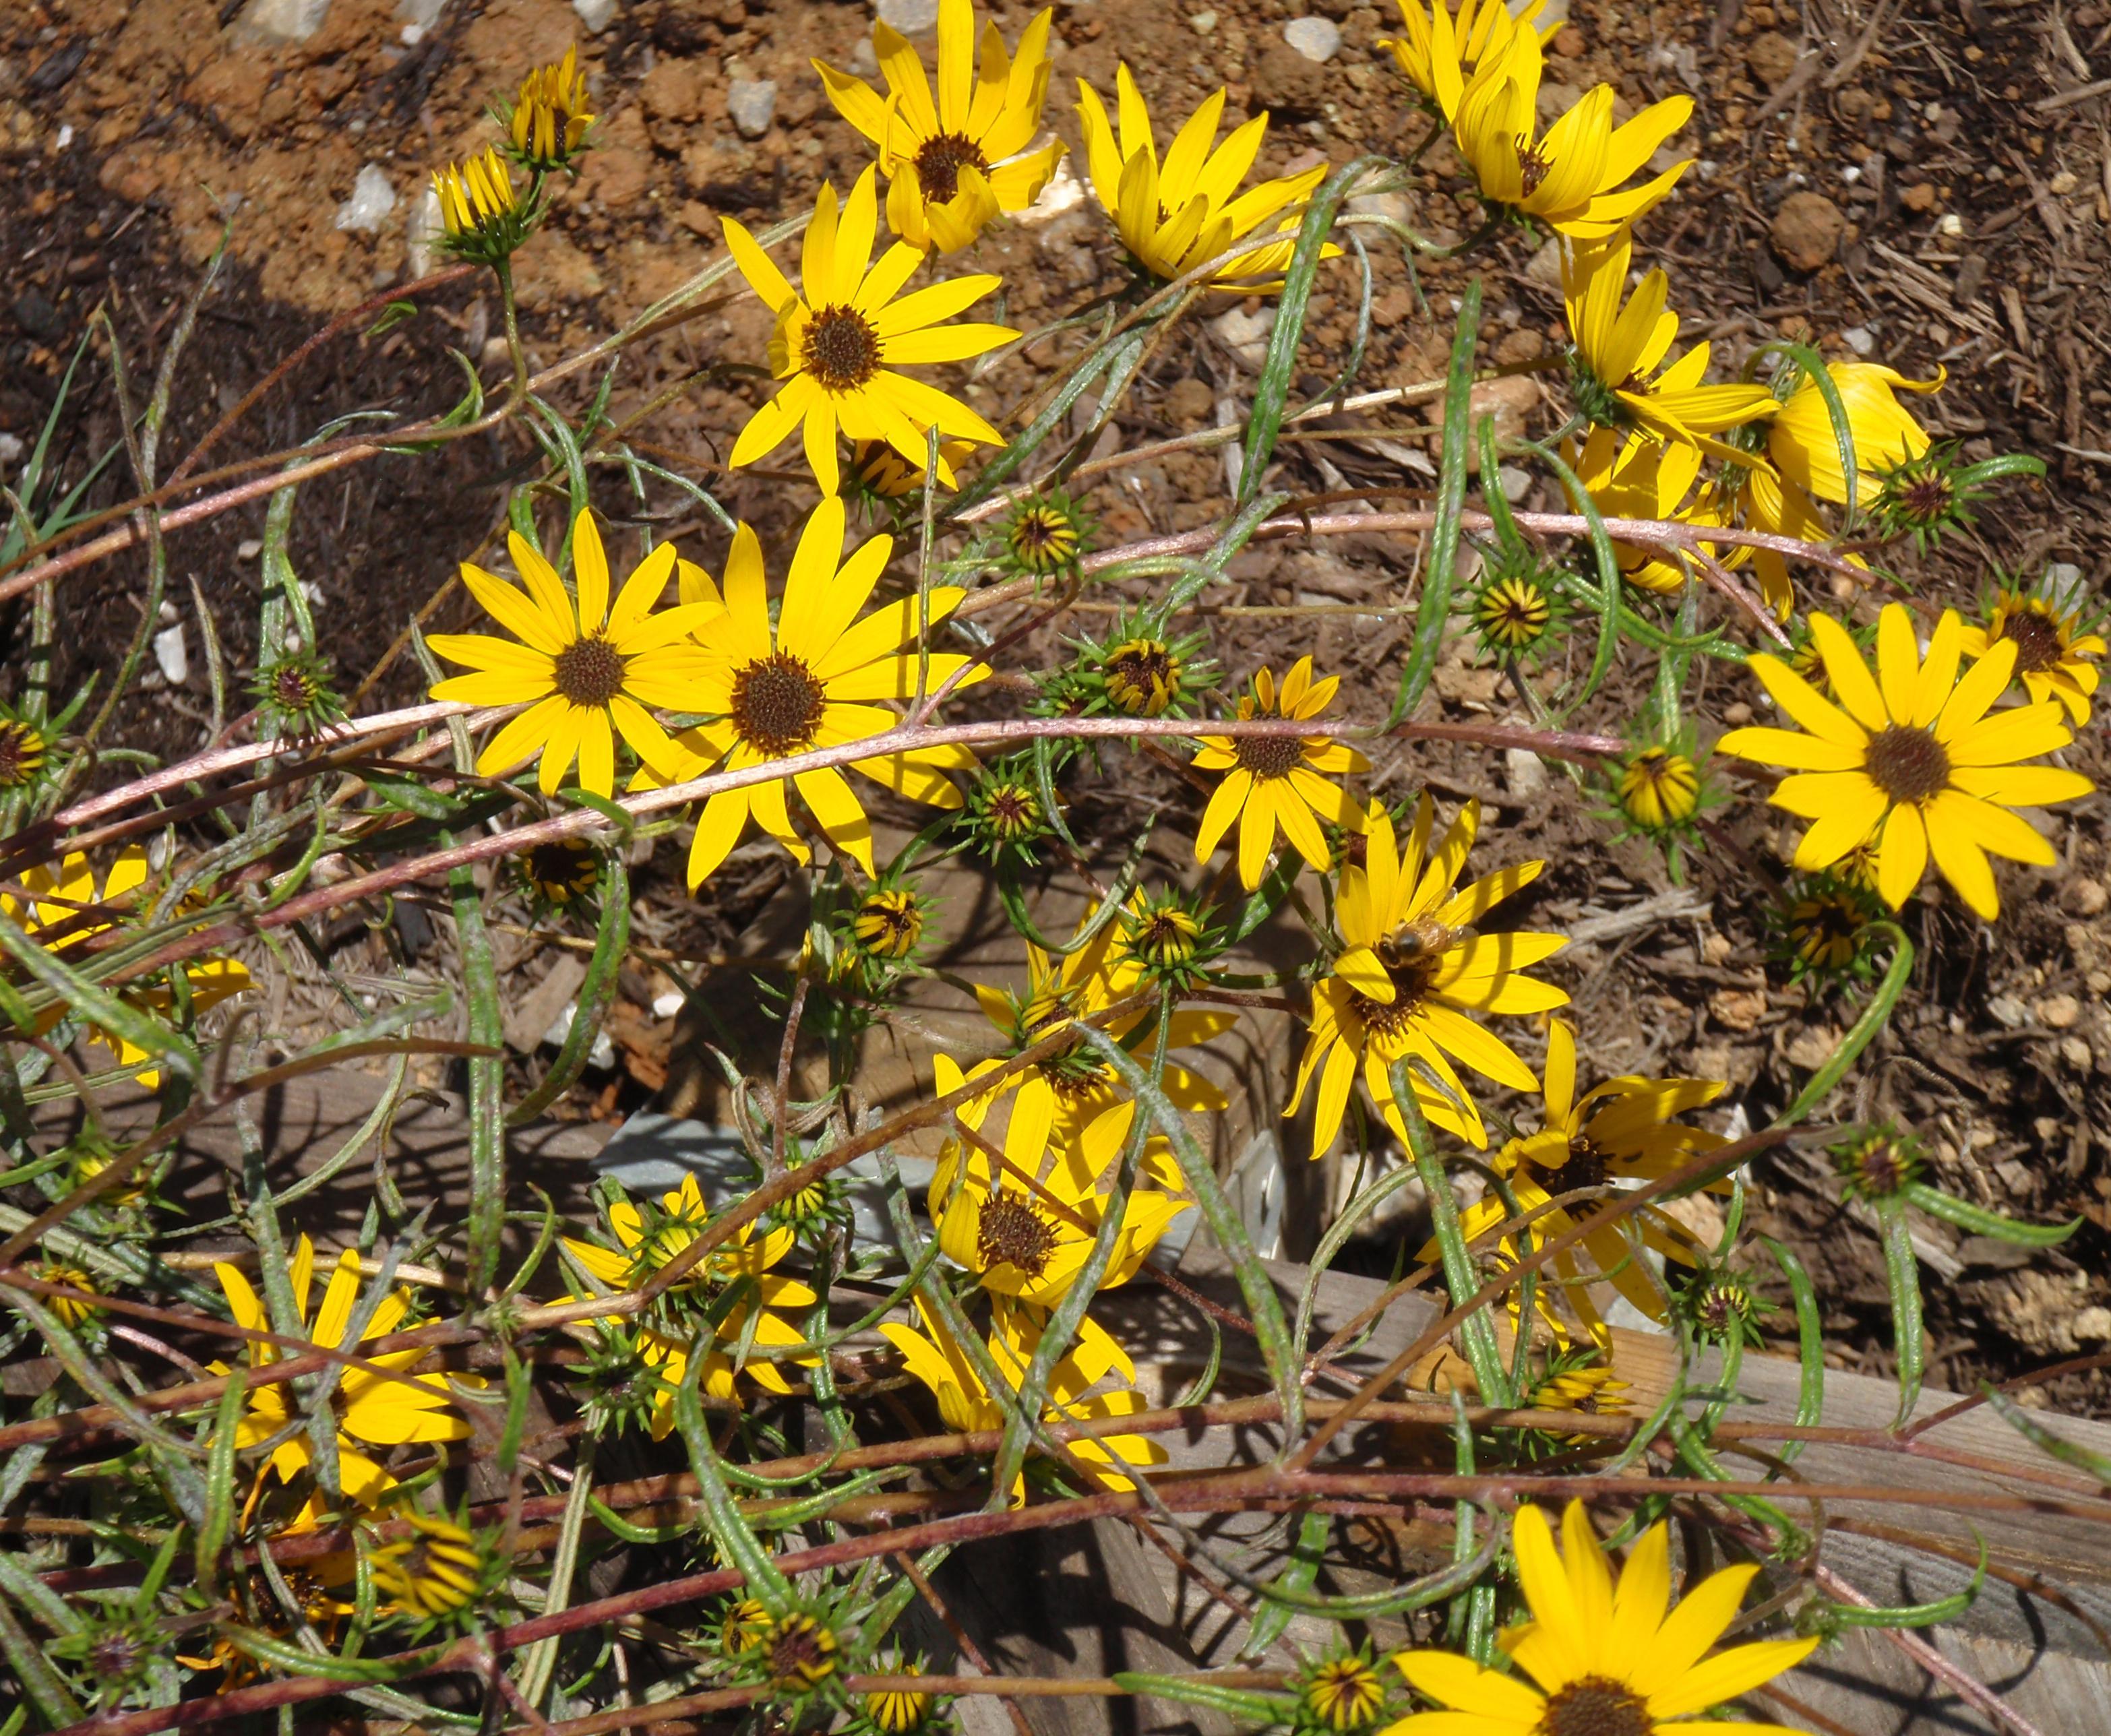 Narrow Leaved Sunflower Swamp Sunflower Tennessee Smart Yards